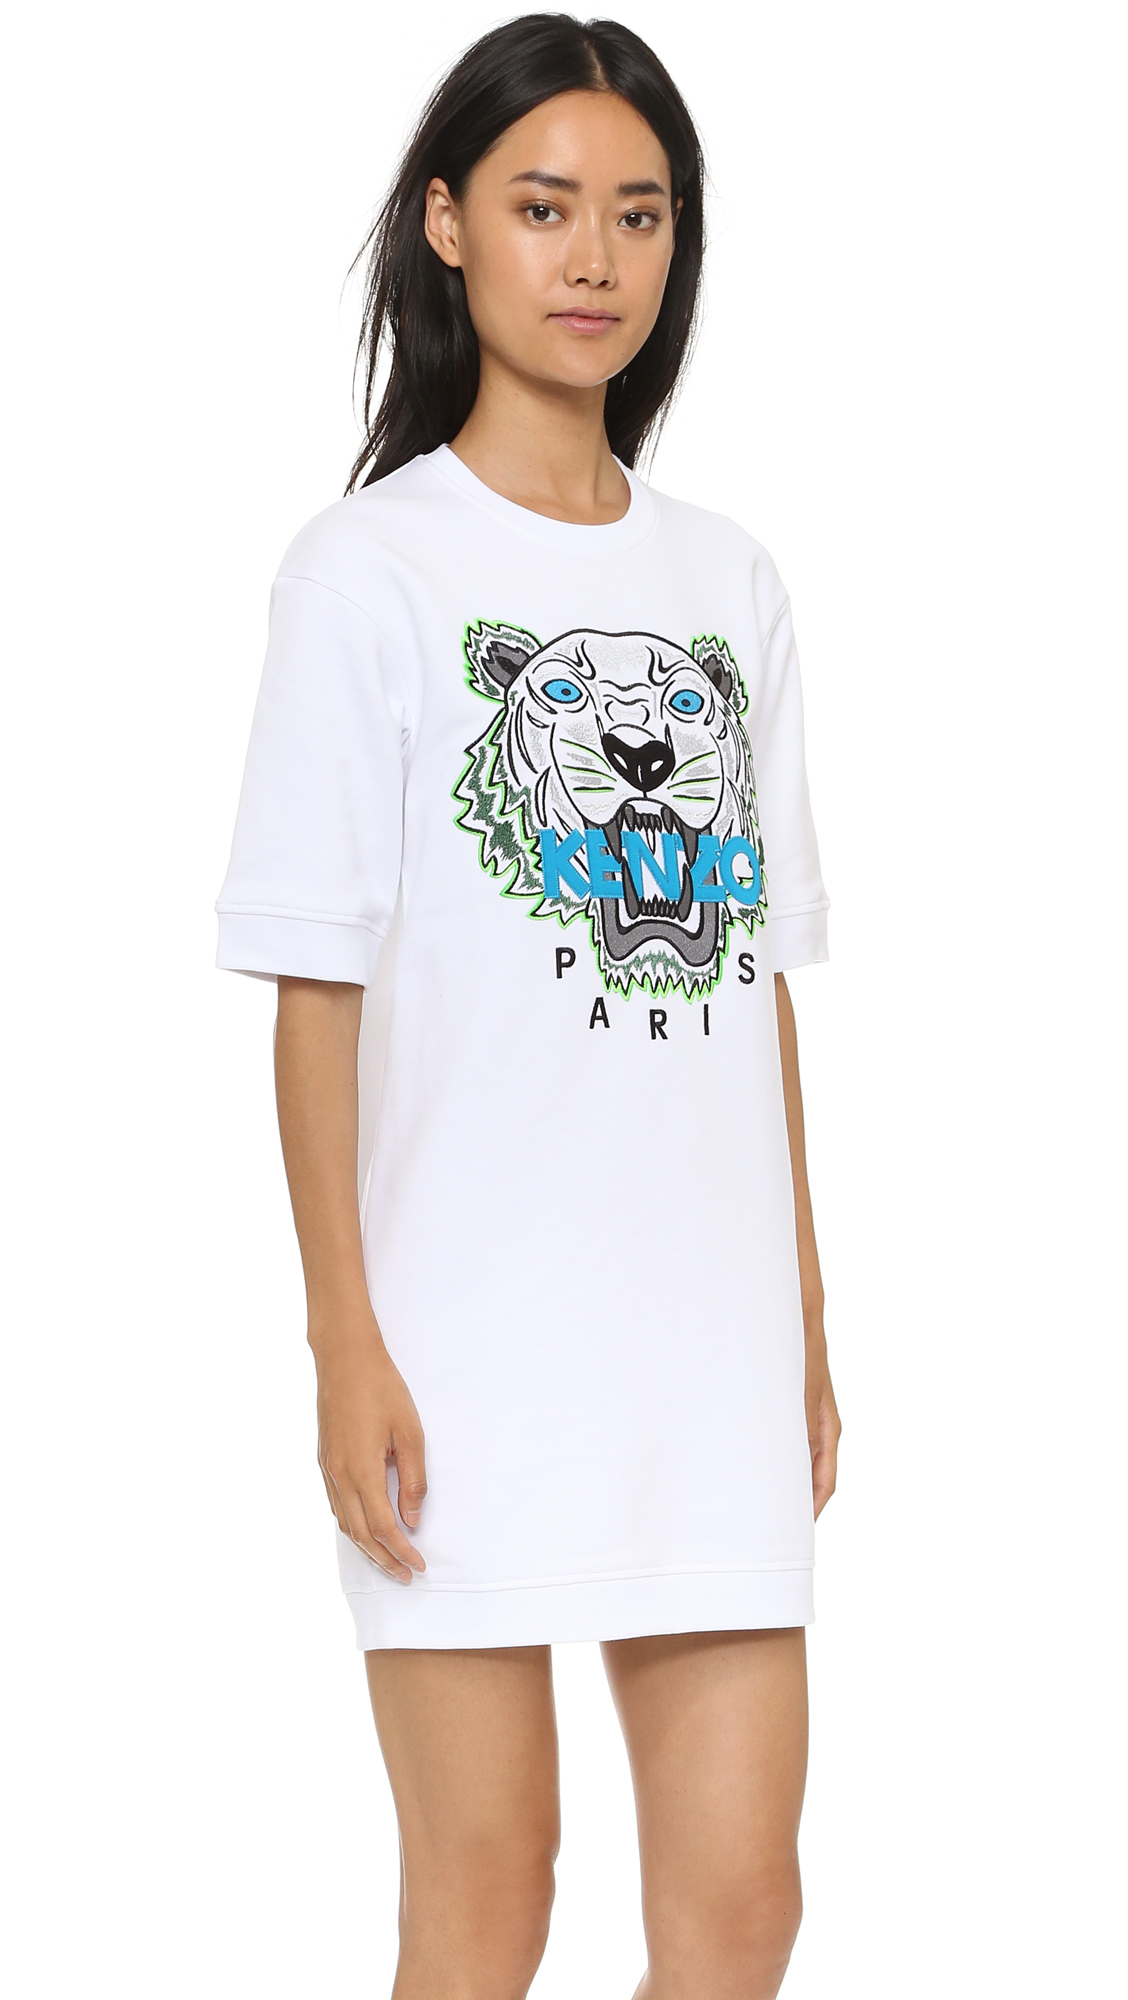 c7381a3a1d86 KENZO Tiger Sweatshirt Dress in White - Lyst